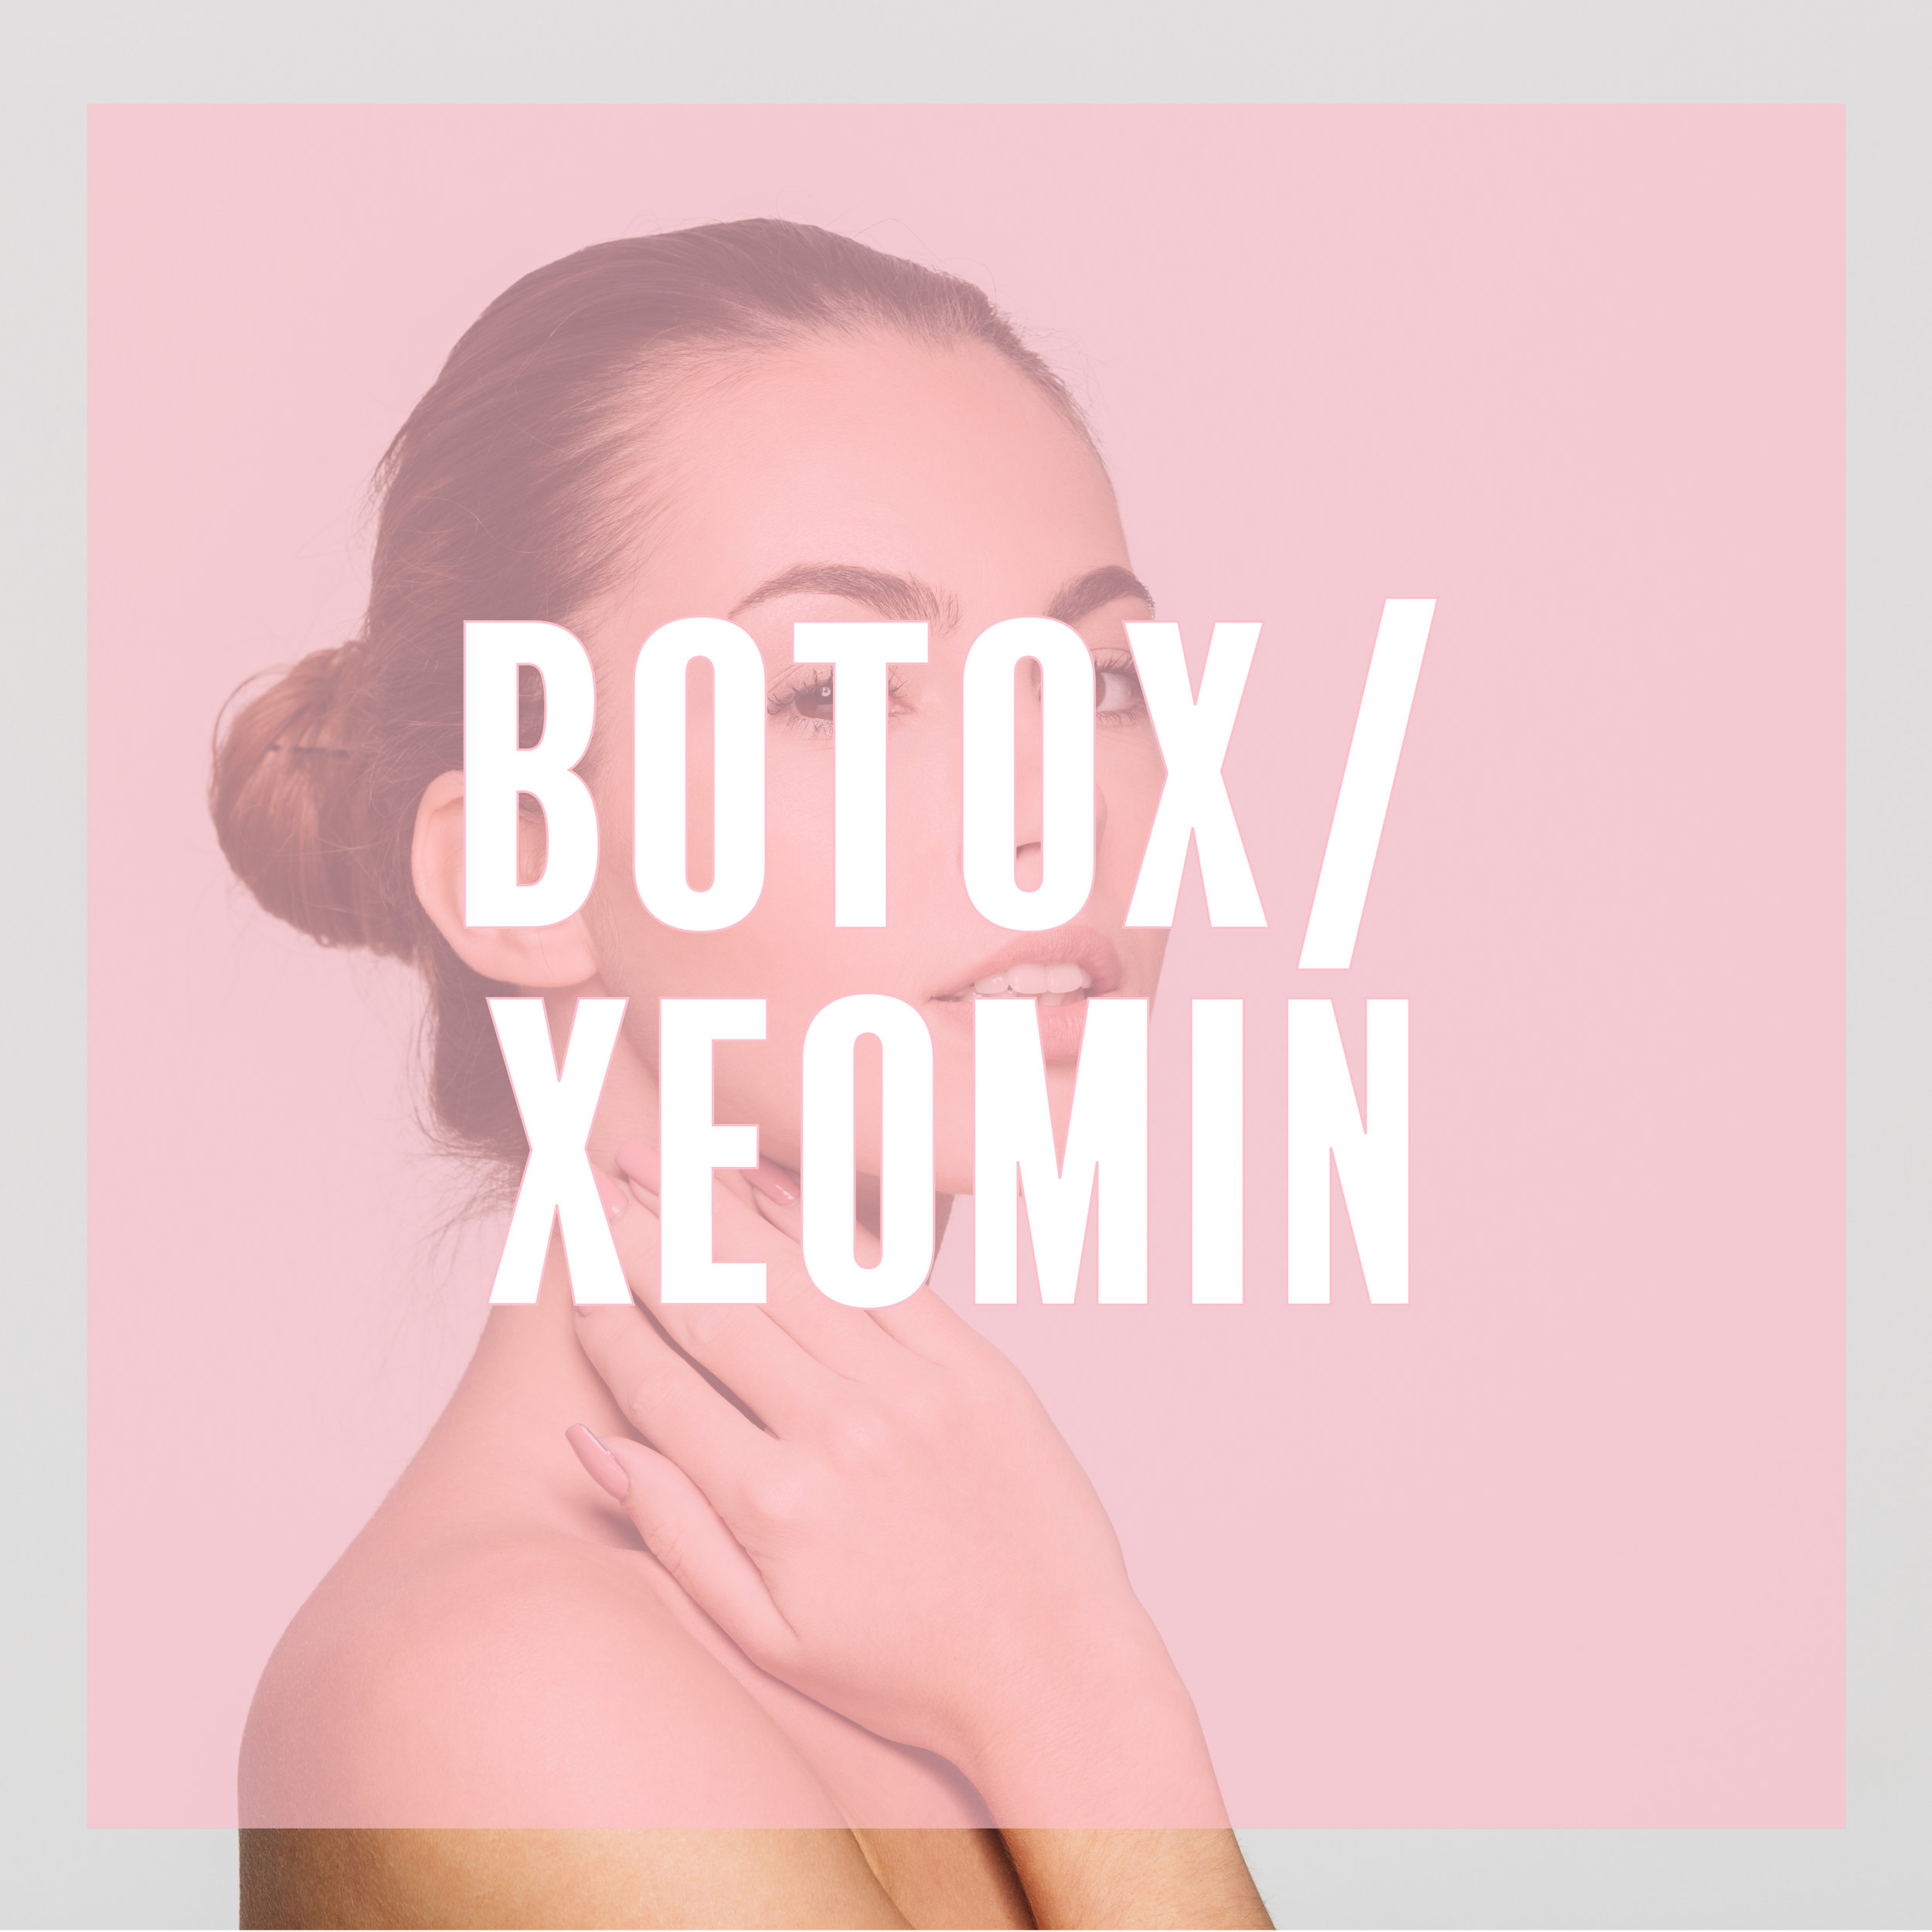 Botox_Xeomin.jpg